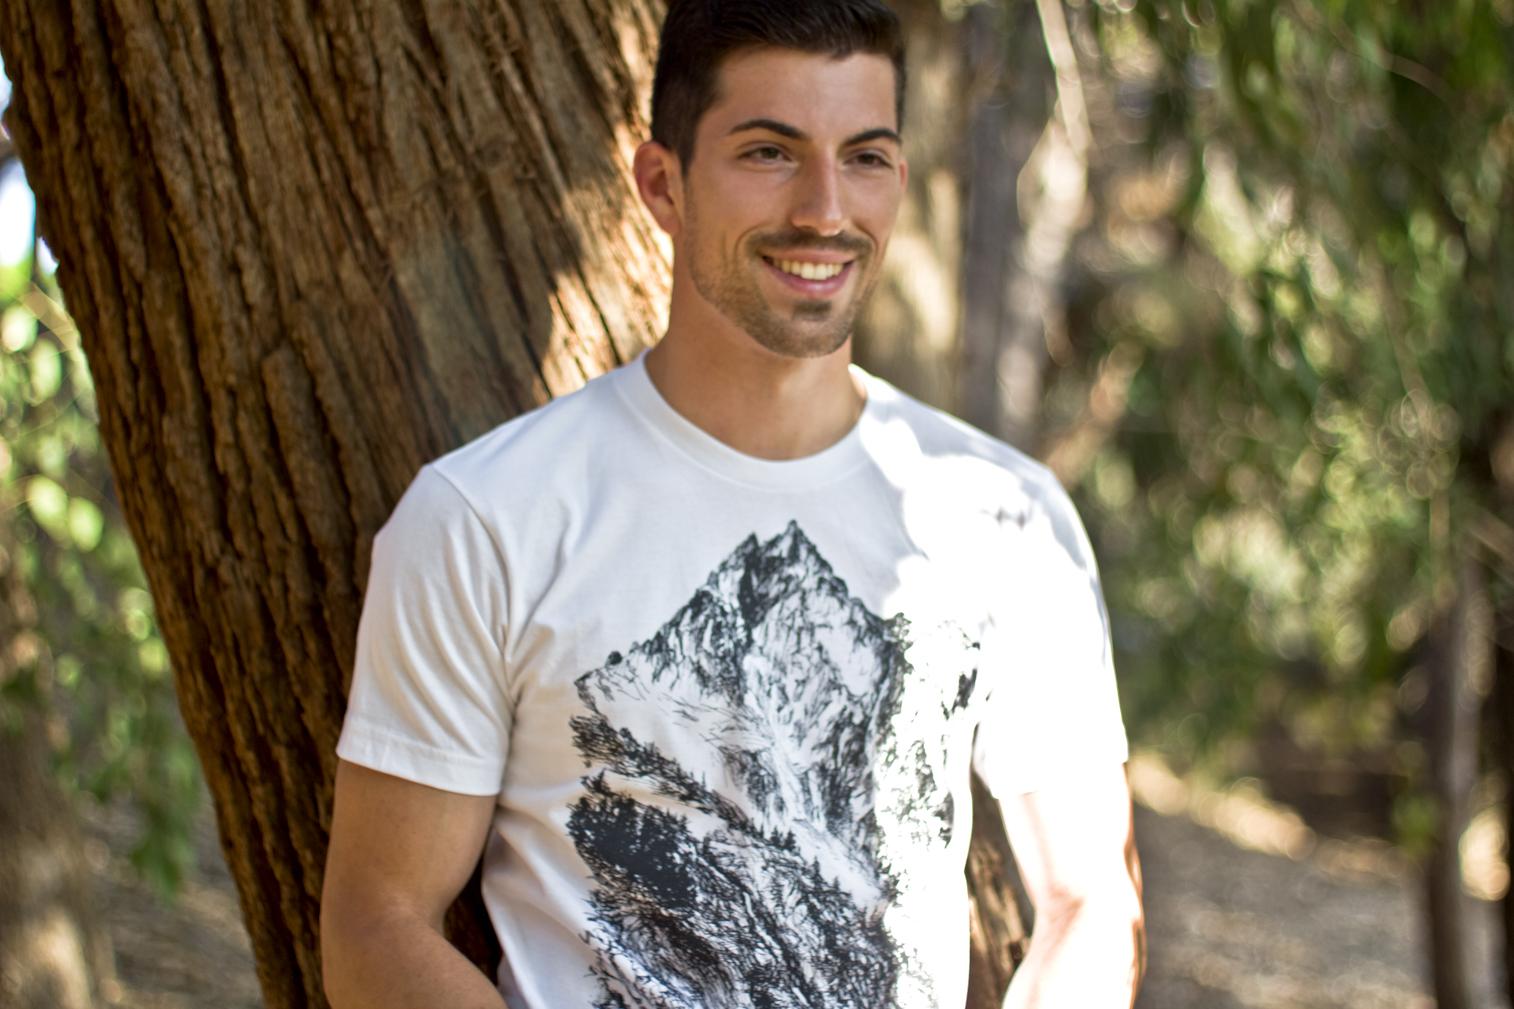 Sergio wearing the Ink Tshirt